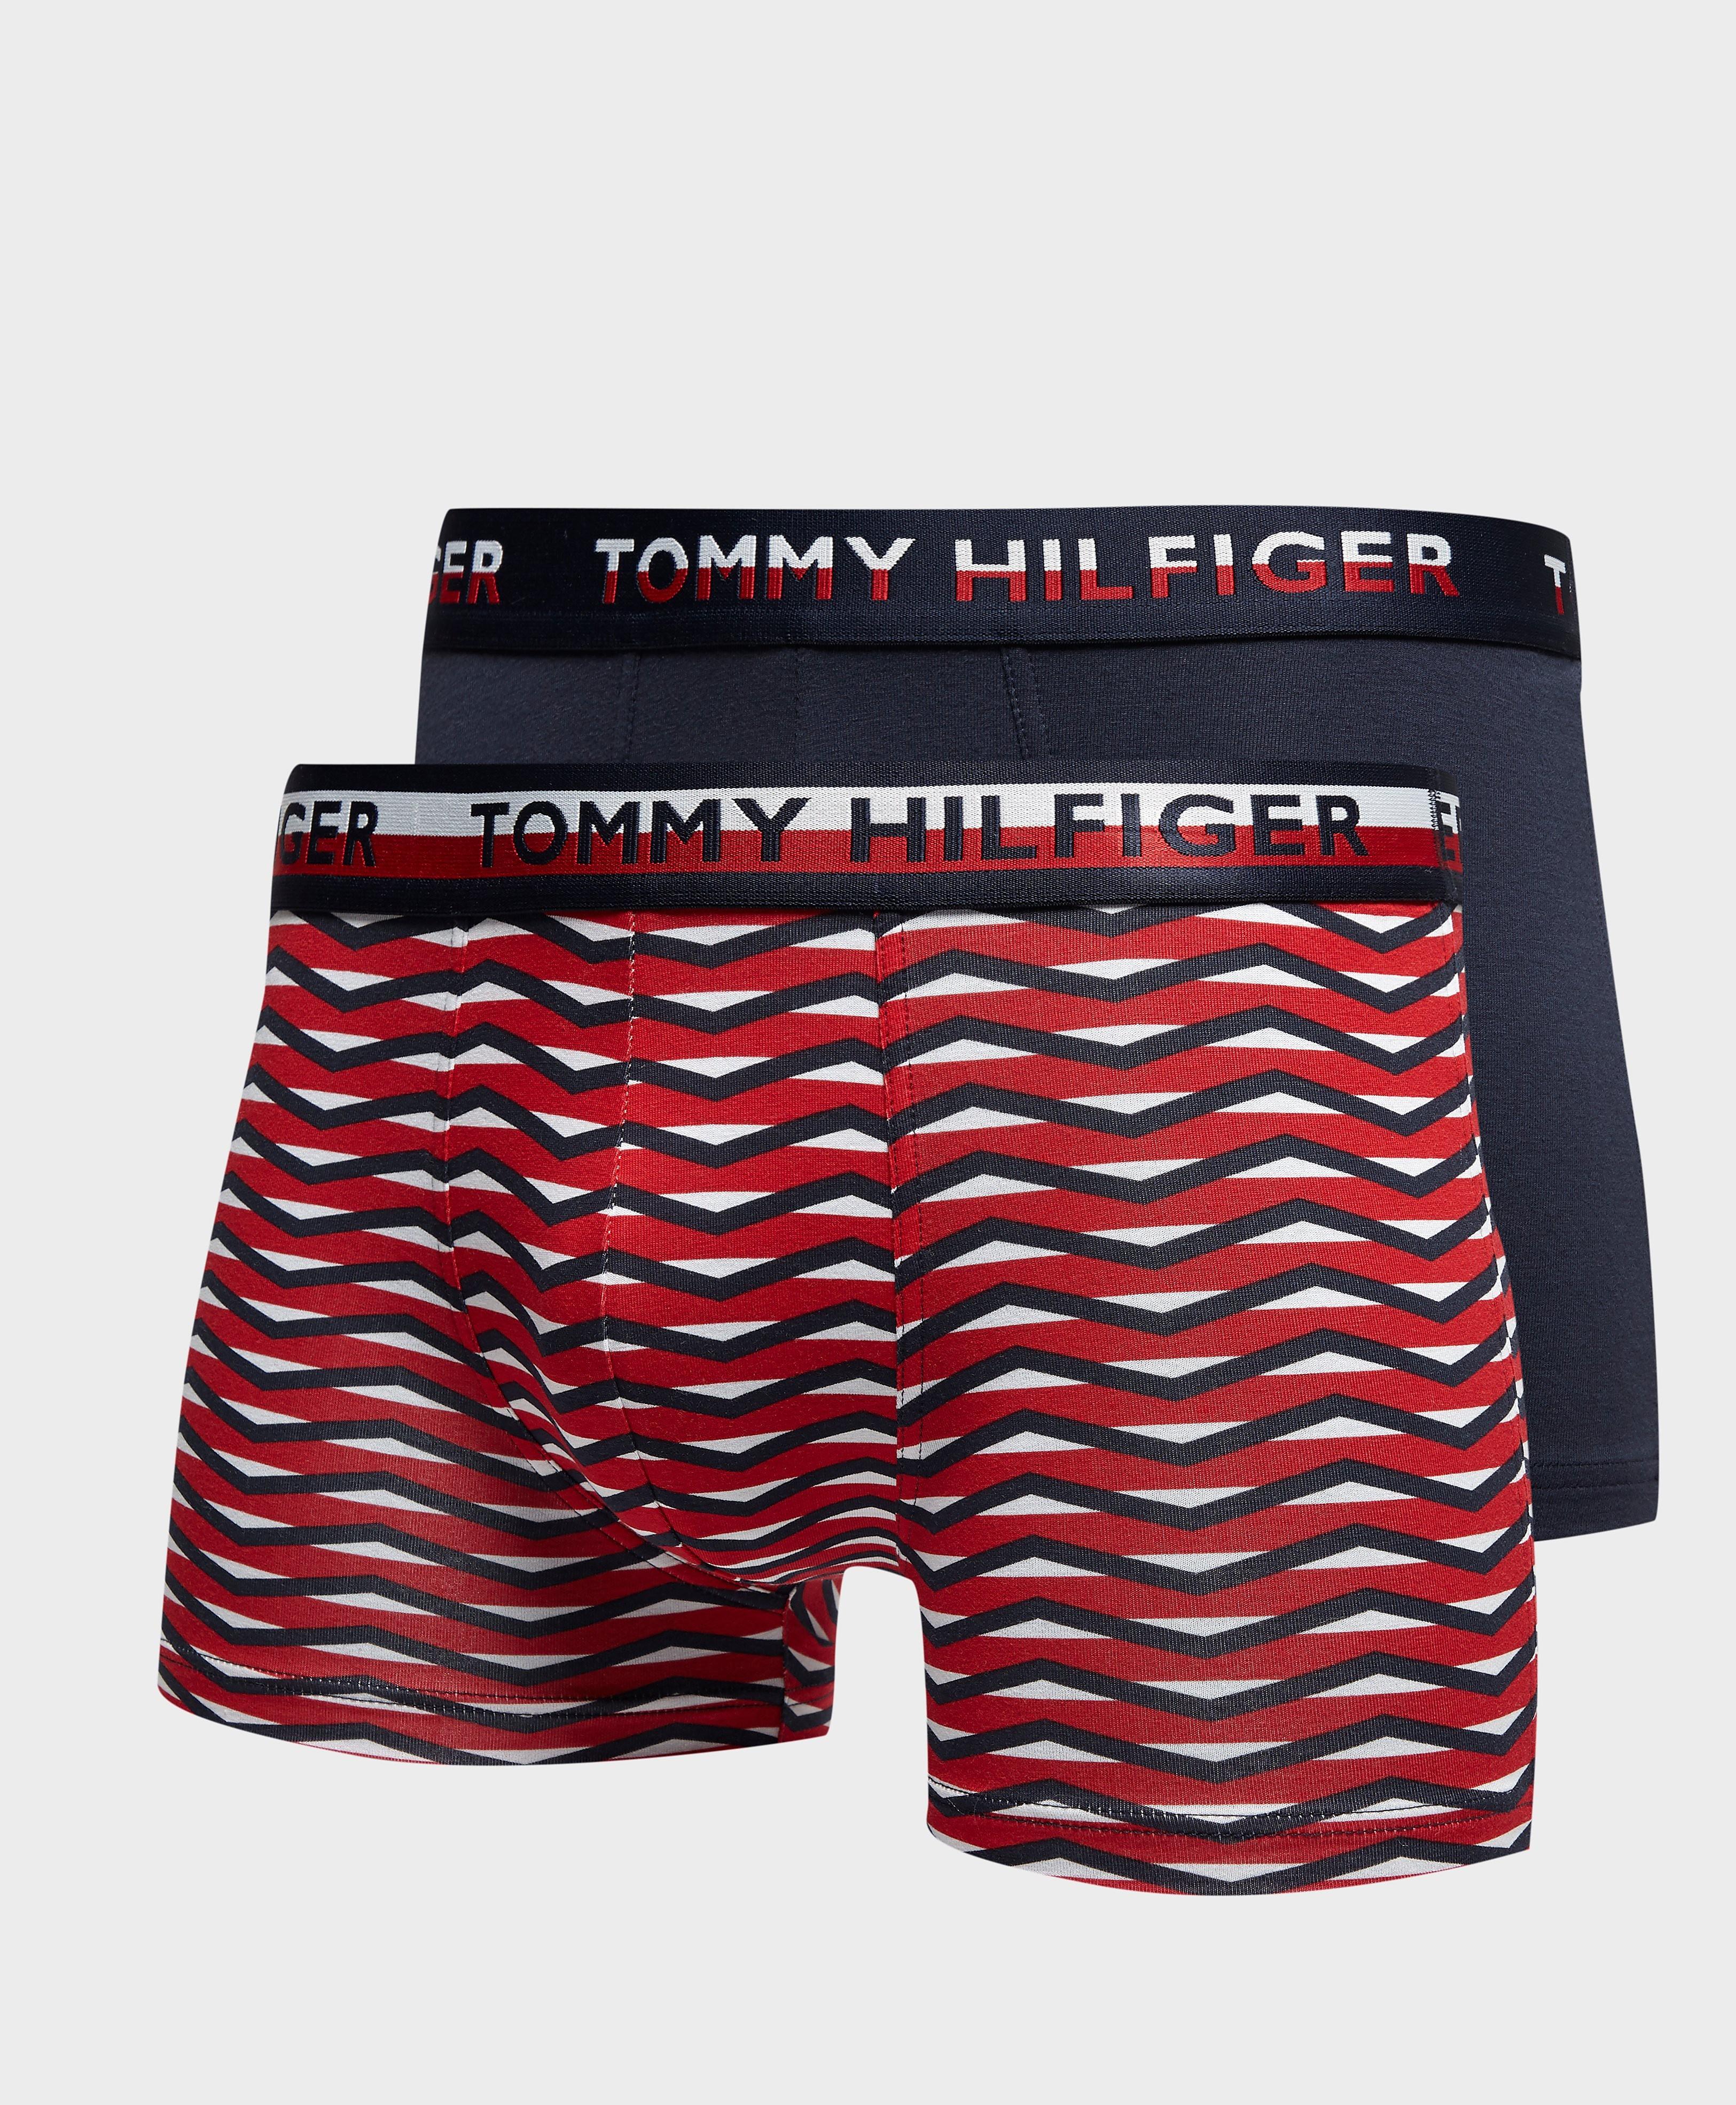 Tommy Hilfiger 2-Pack Boxer Shorts